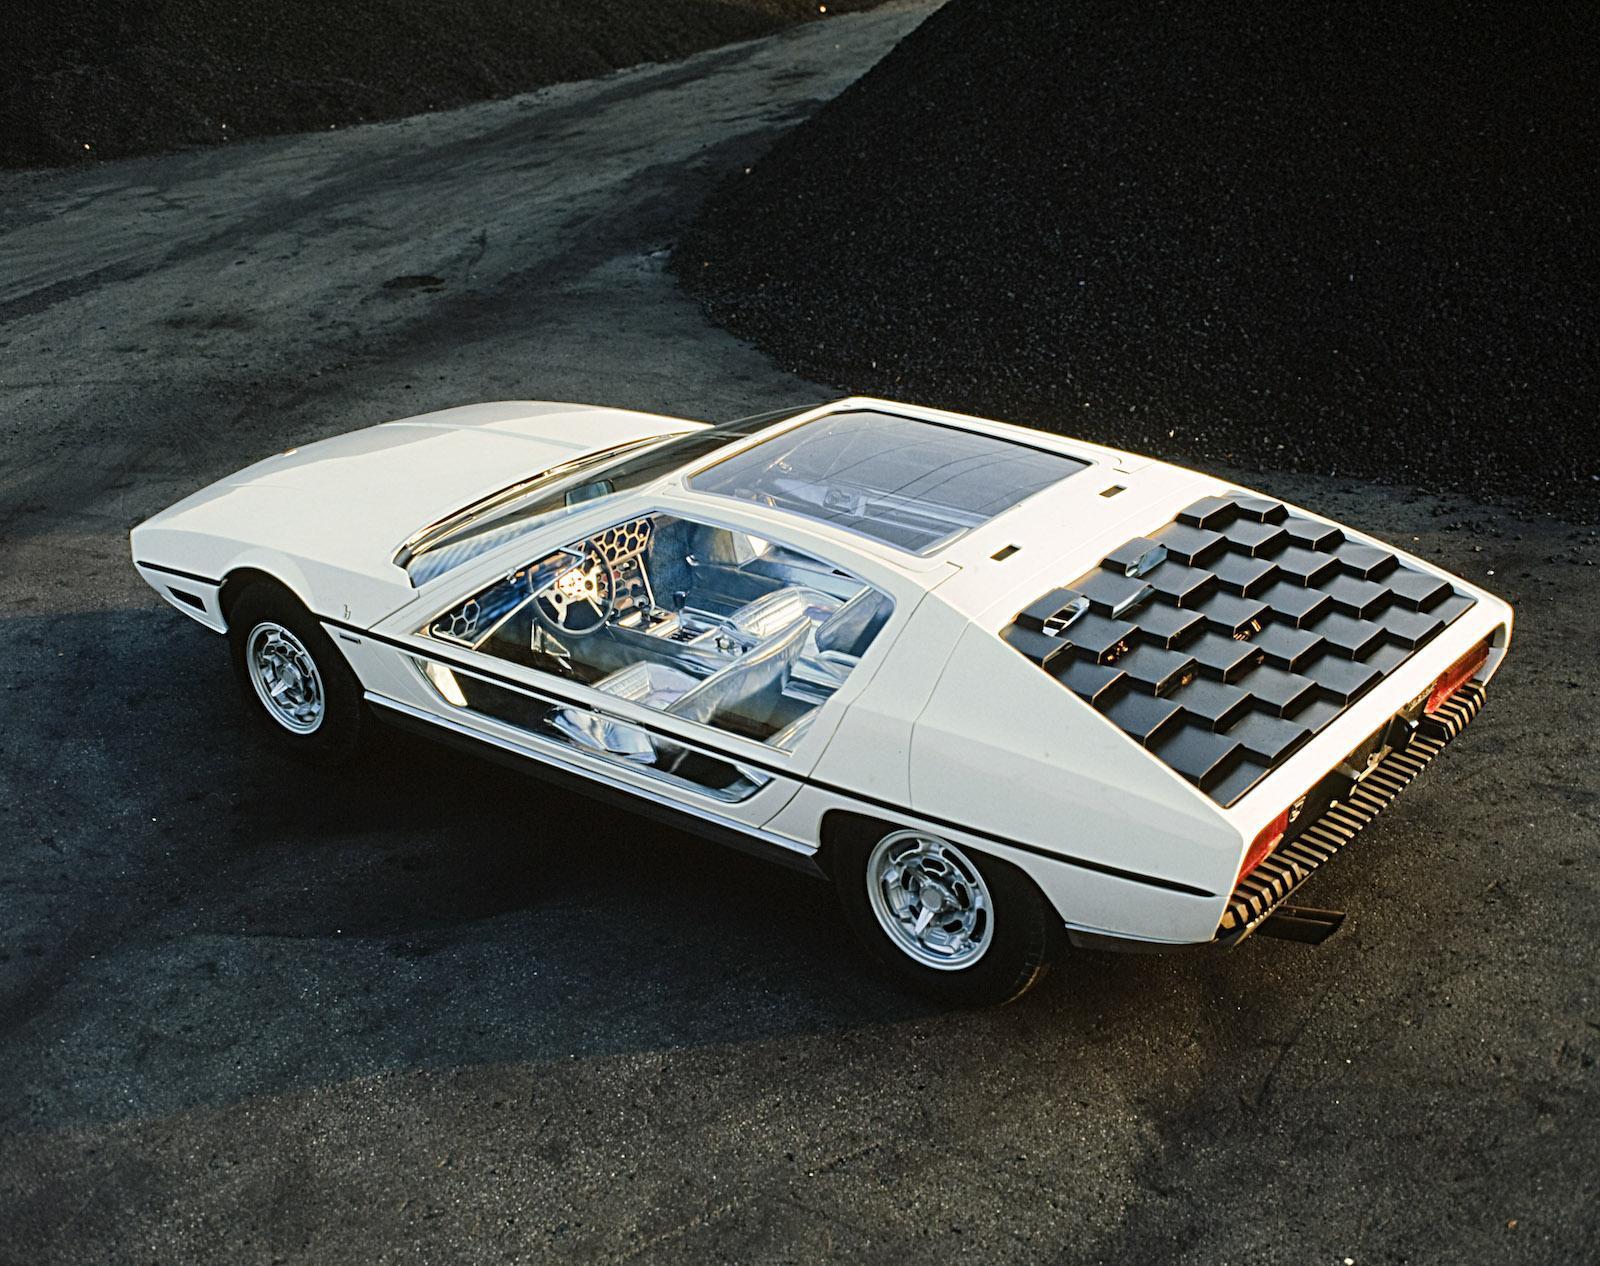 Top 10 Lamborghini Concept Cars